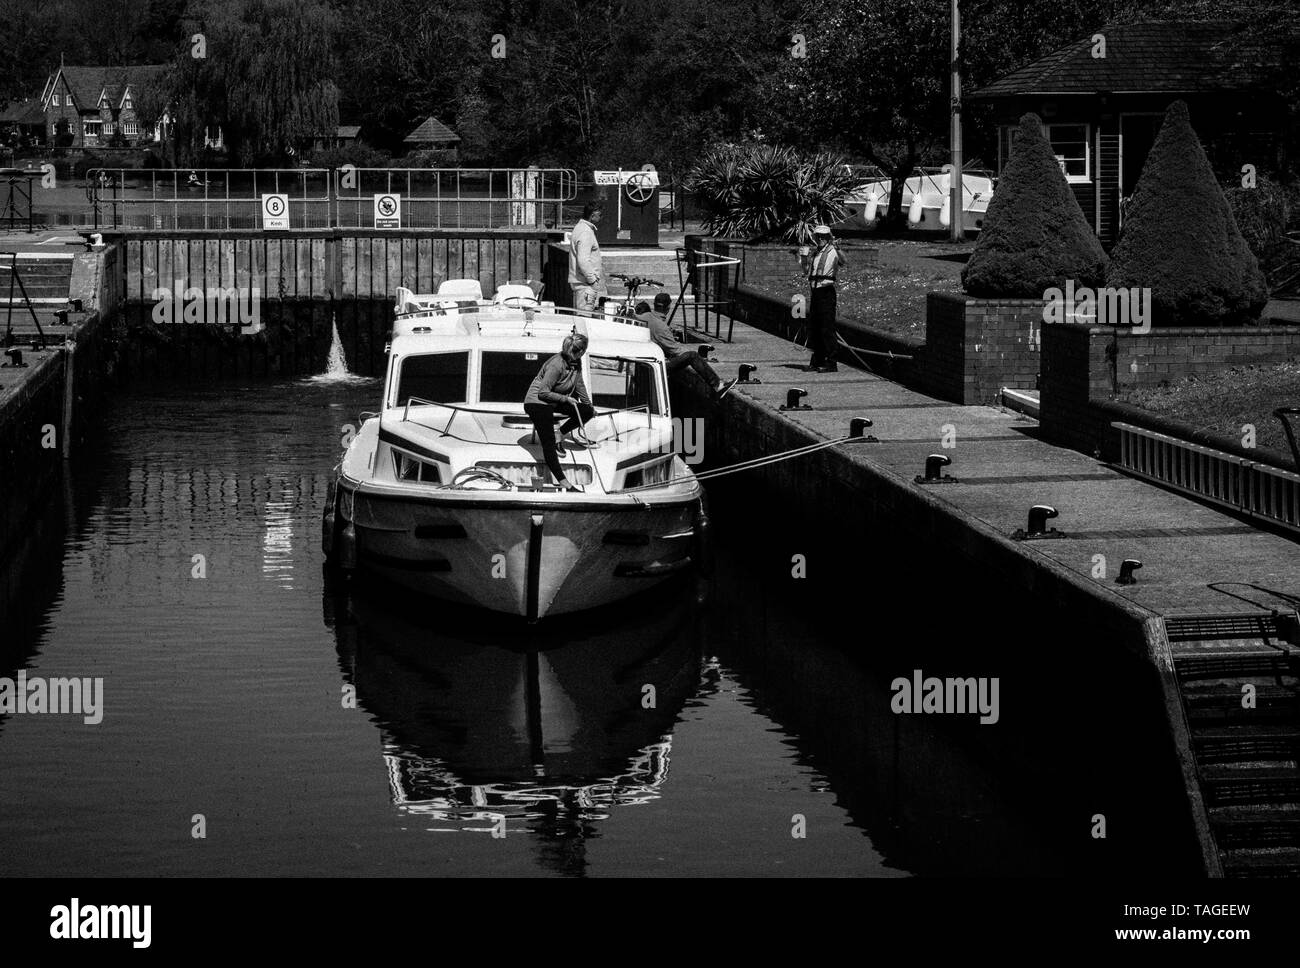 Boat Passing threw Hambledon Lock, River Thames, Berkshire, England, UK, GB. - Stock Image